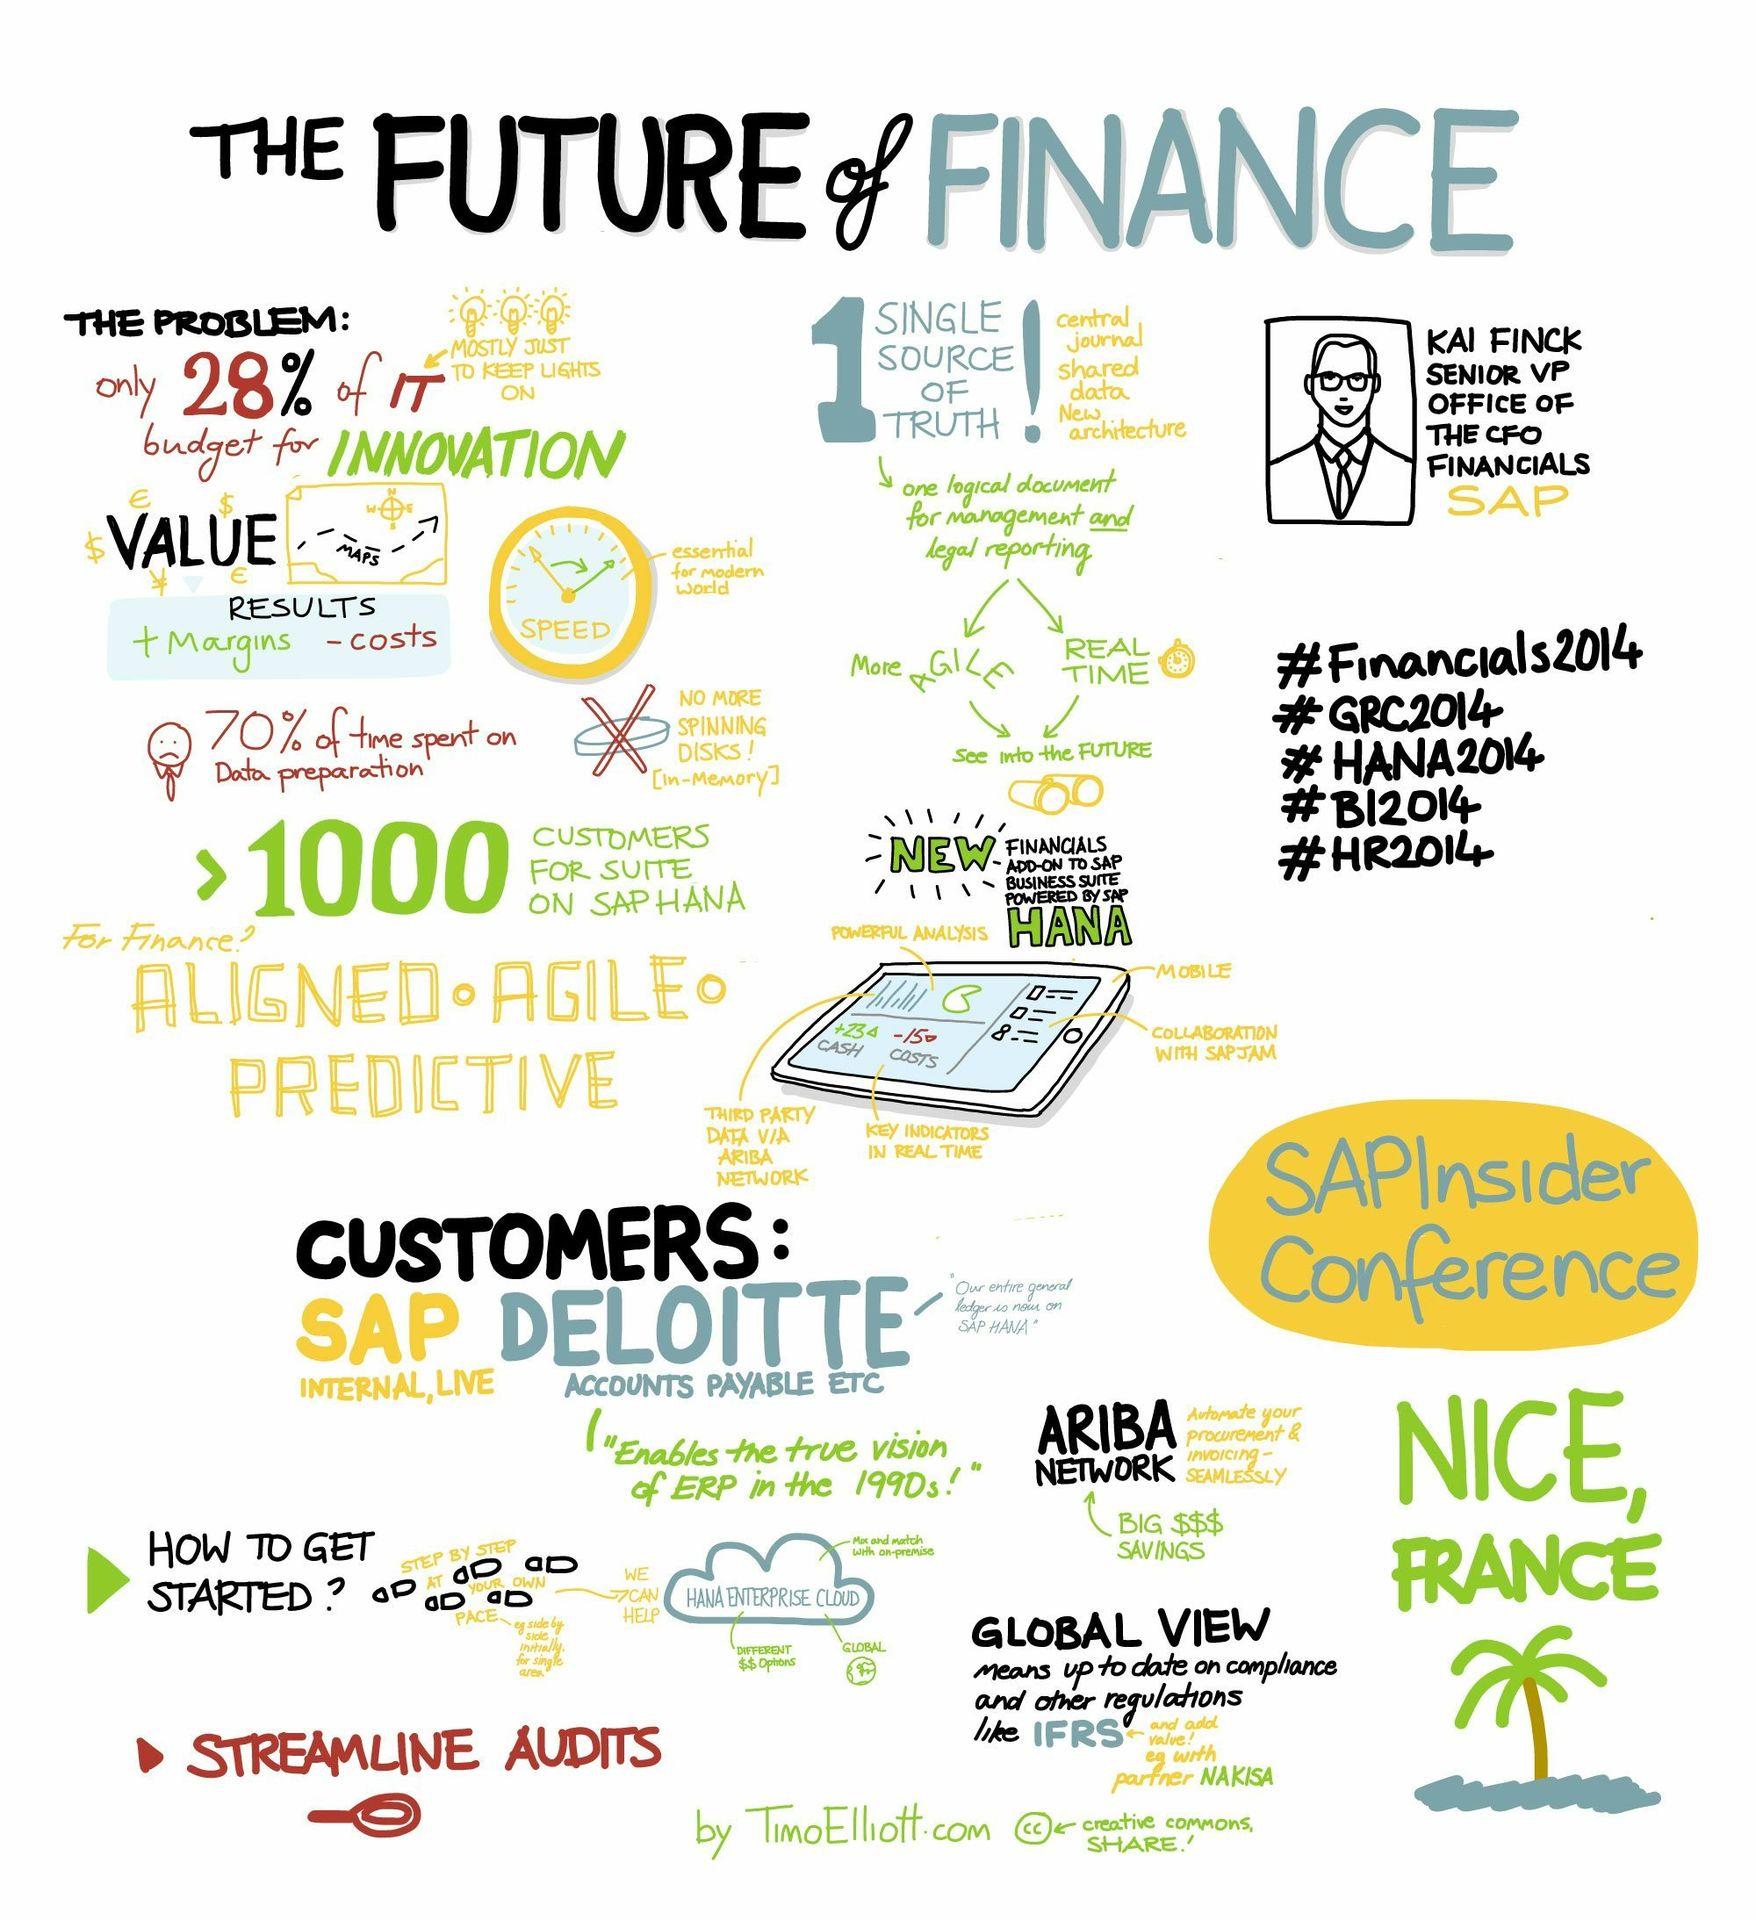 financials-2014-keynote-sketchnote-original-finance